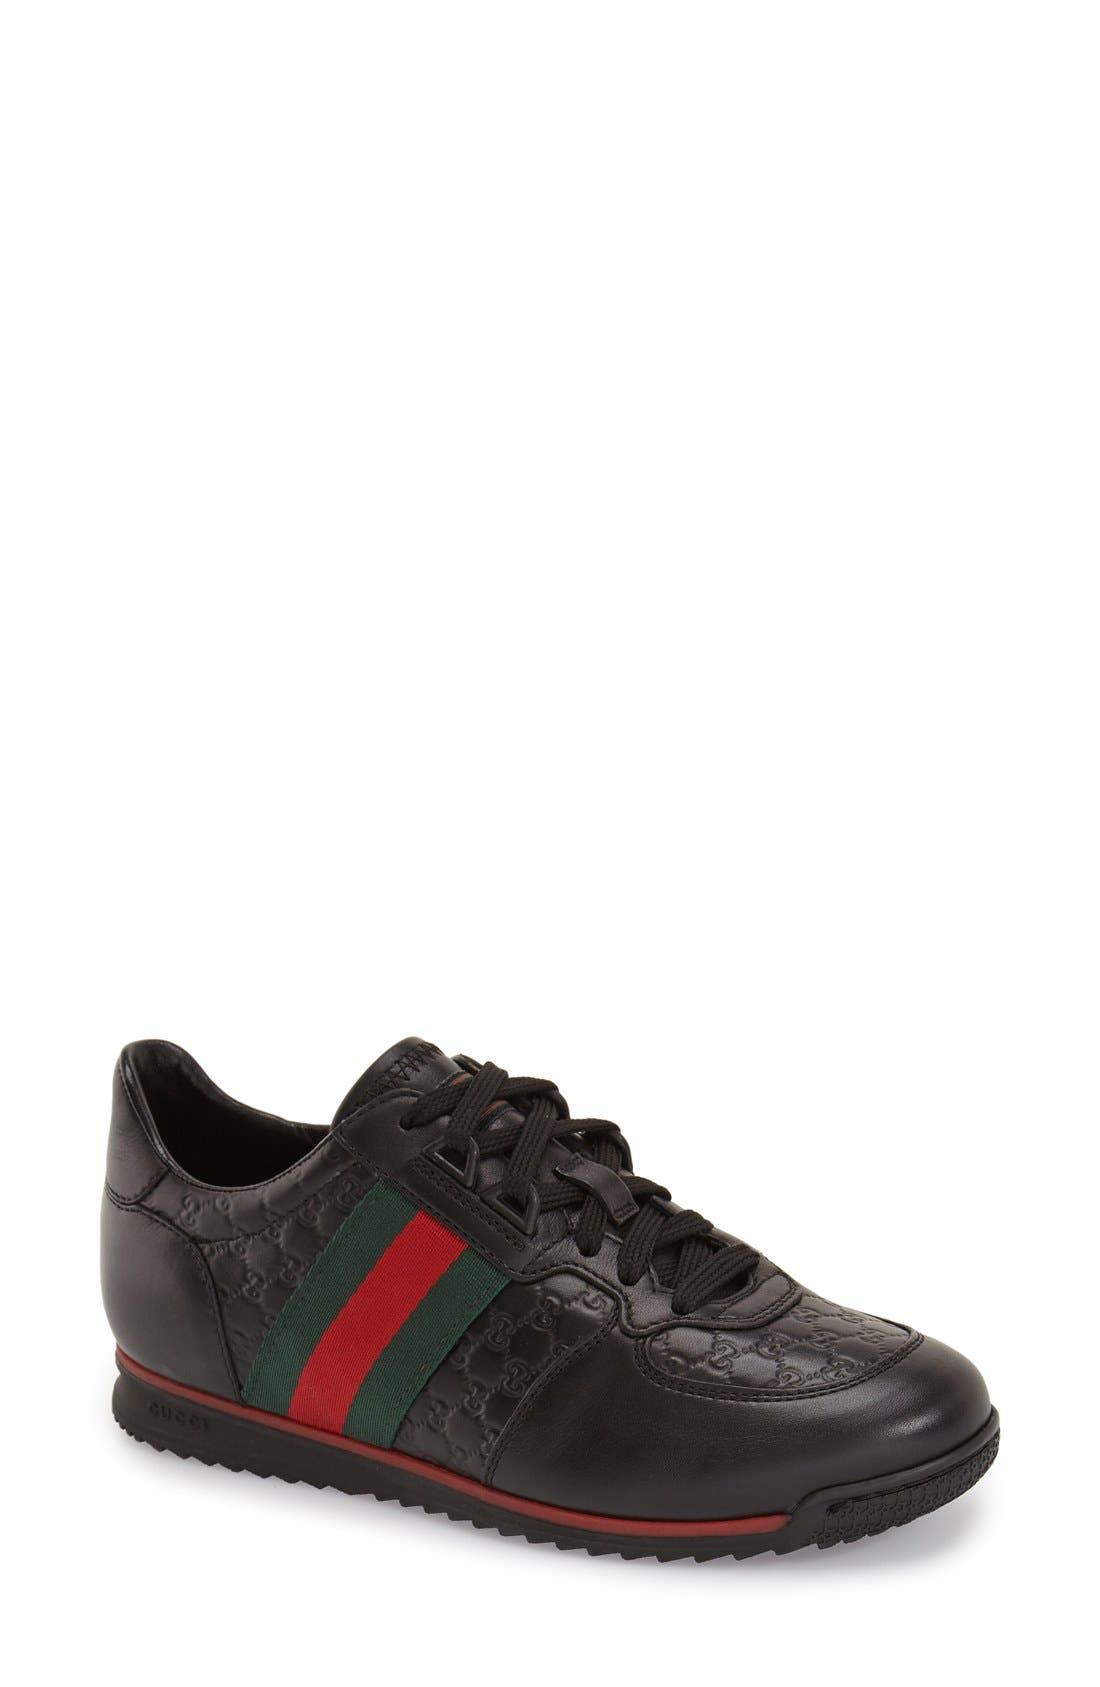 Main Image - Gucci 'SL73' Sneaker (Women)